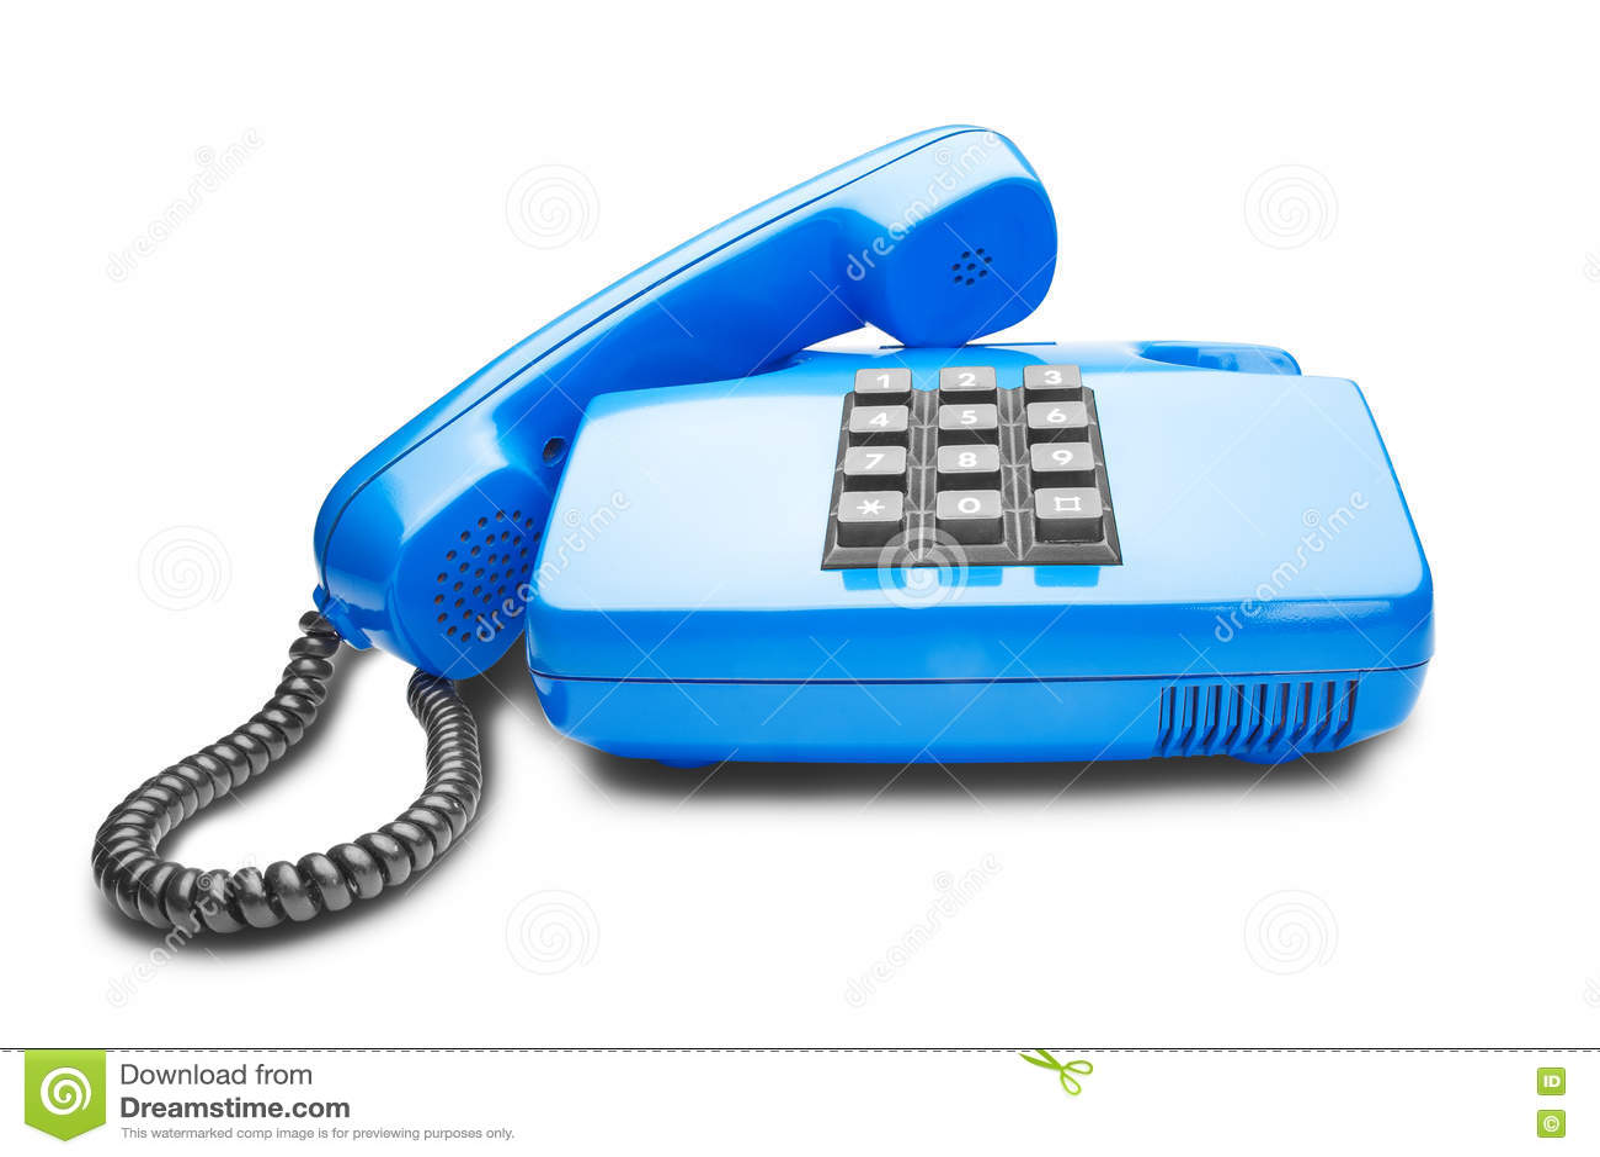 Handset Lies On A Blue Landline Phone Stock Photo - Image of